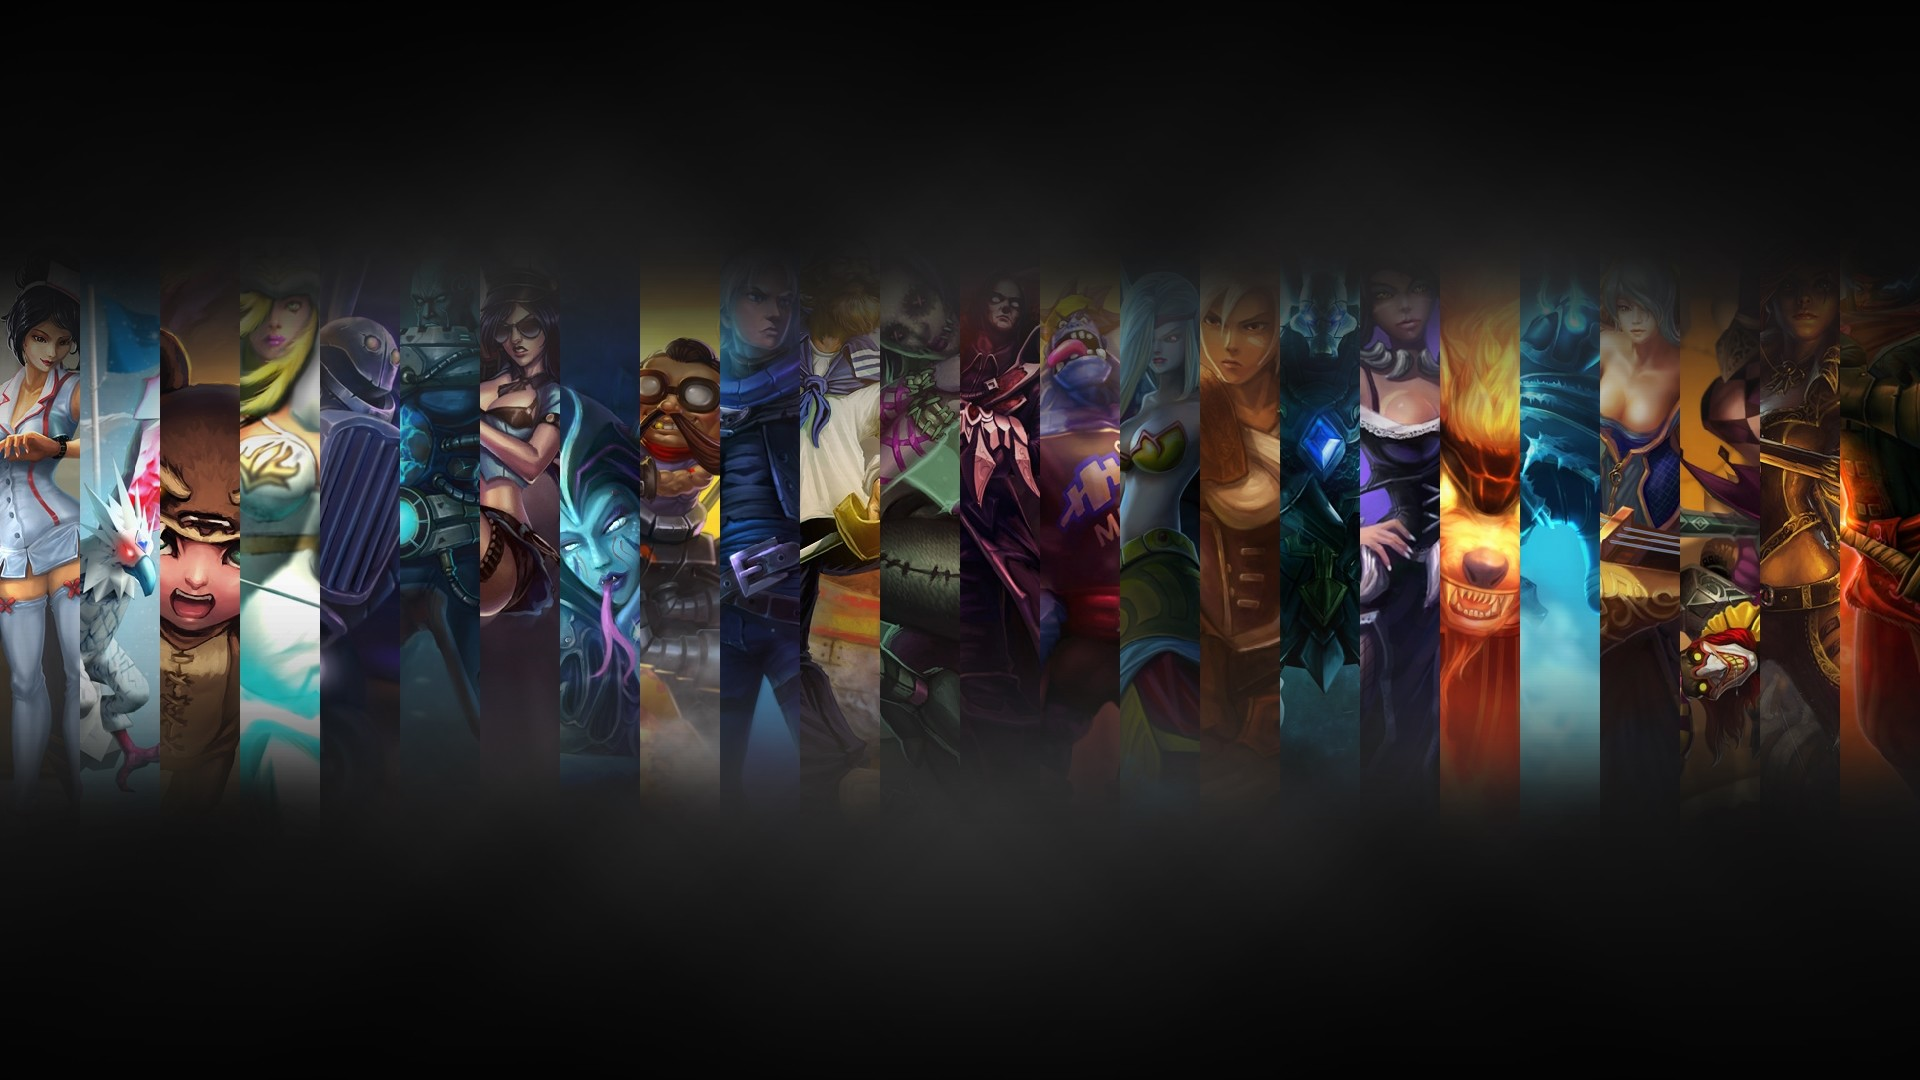 Desktop Backgrounds League Of Legends (53 Wallpapers)